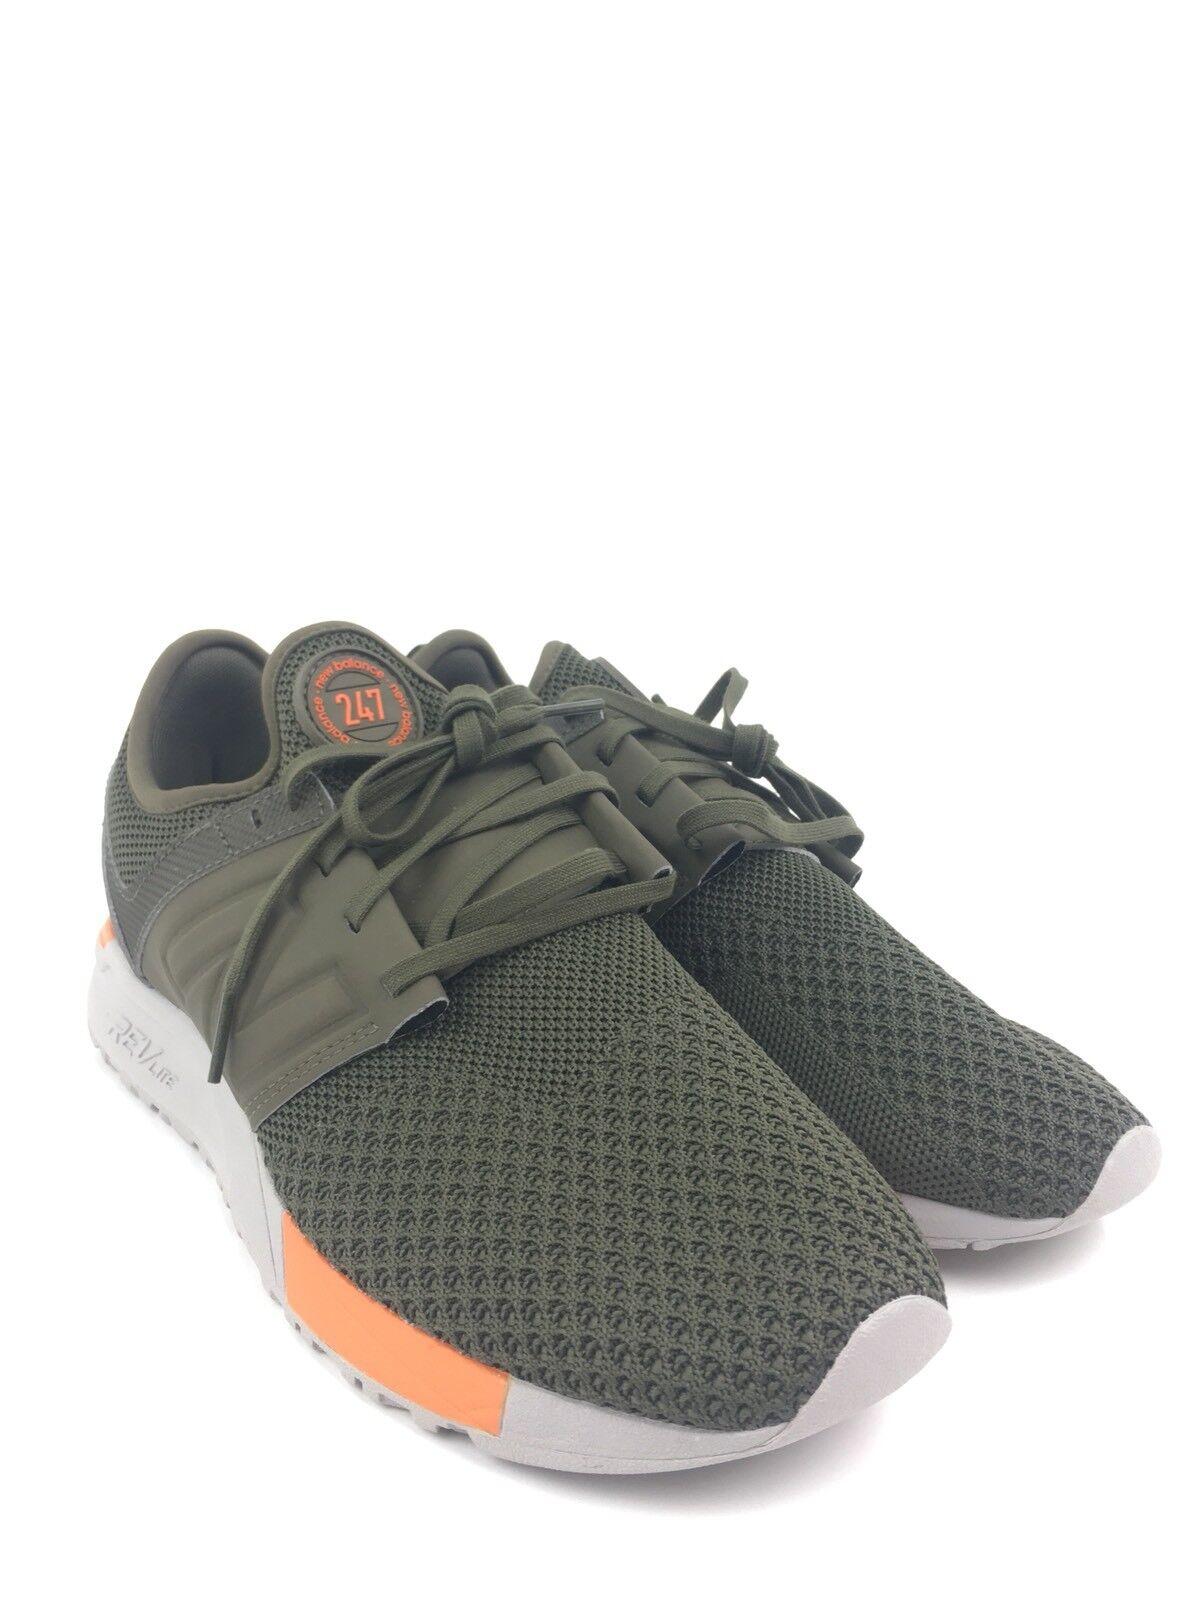 New Balance 247 Olive Winter Knit Running Shoes Men's Size 9M MRL247KO A219